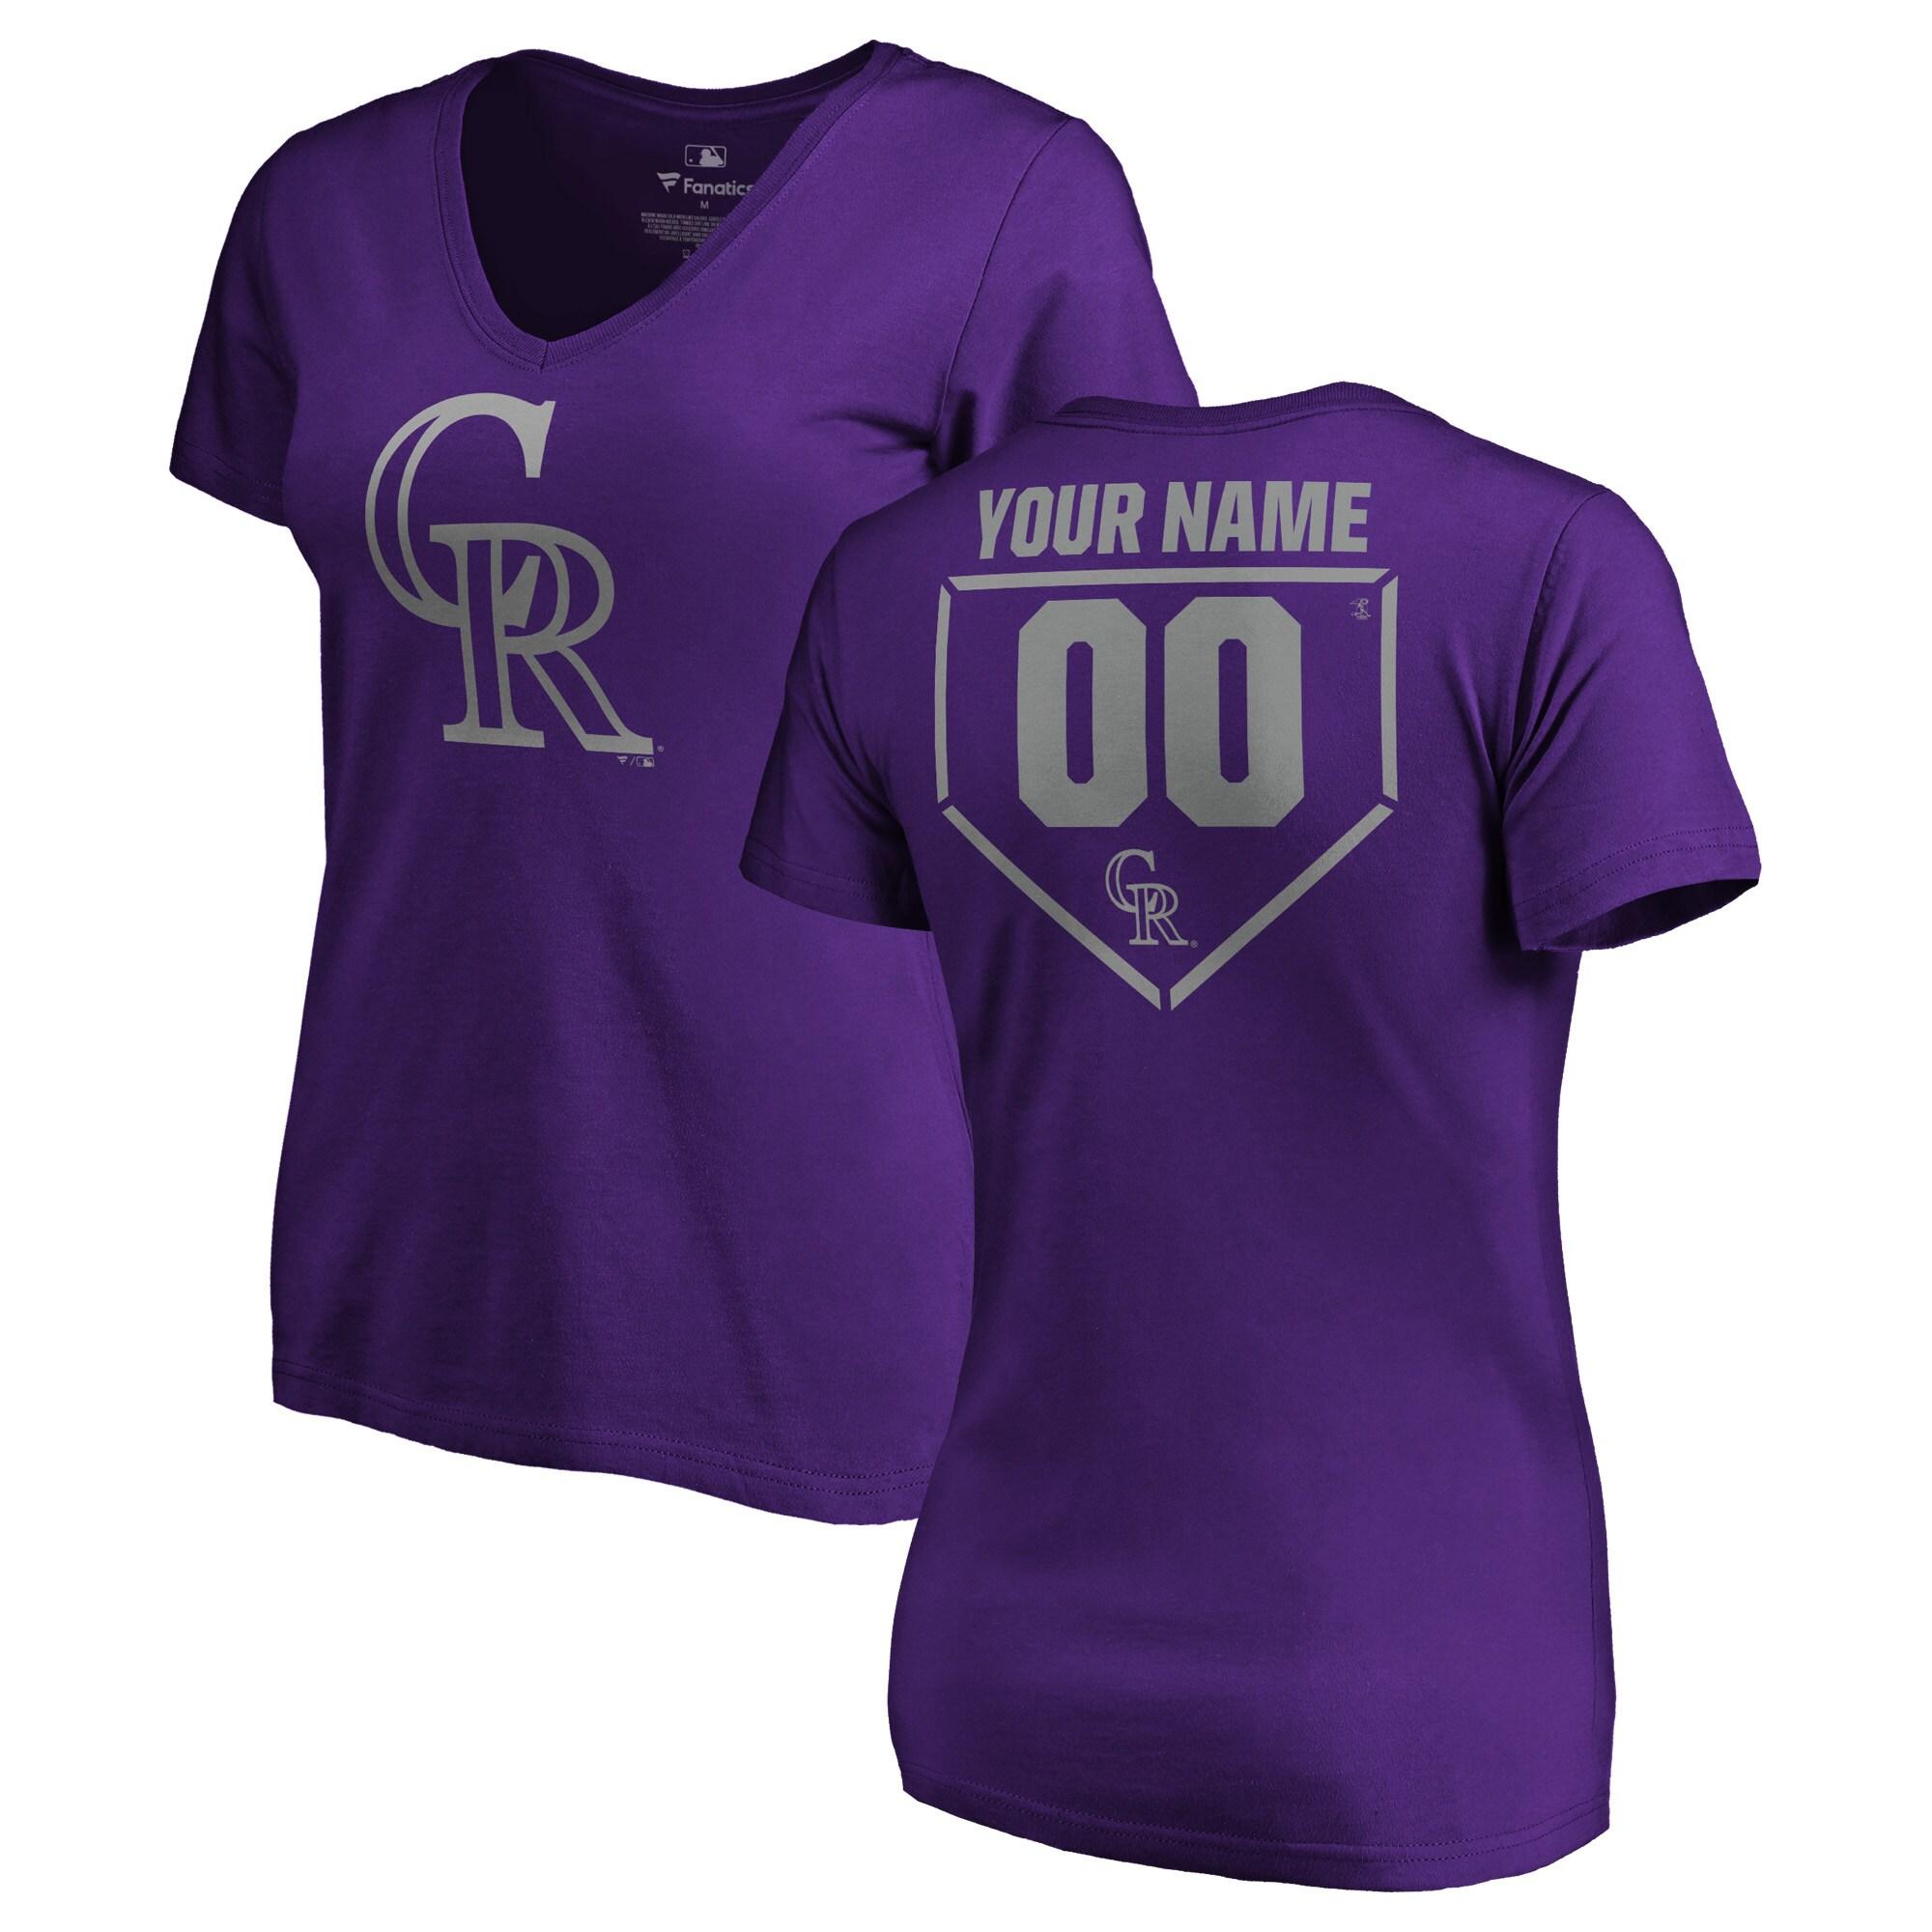 Colorado Rockies Fanatics Branded Women's Personalized RBI Slim Fit V-Neck T-Shirt - Purple